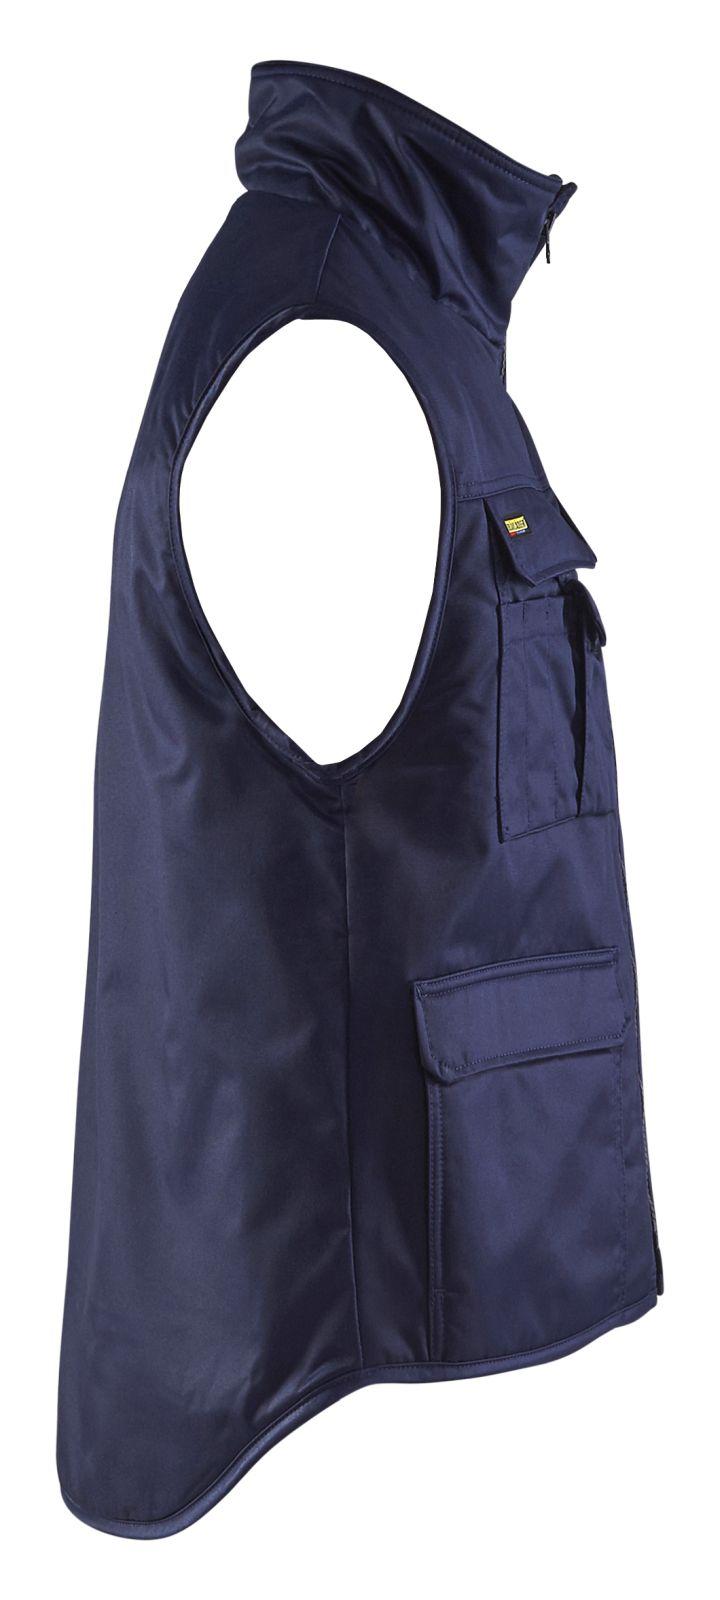 Blaklader Bodywarmers 38011900 marineblauw(8900)